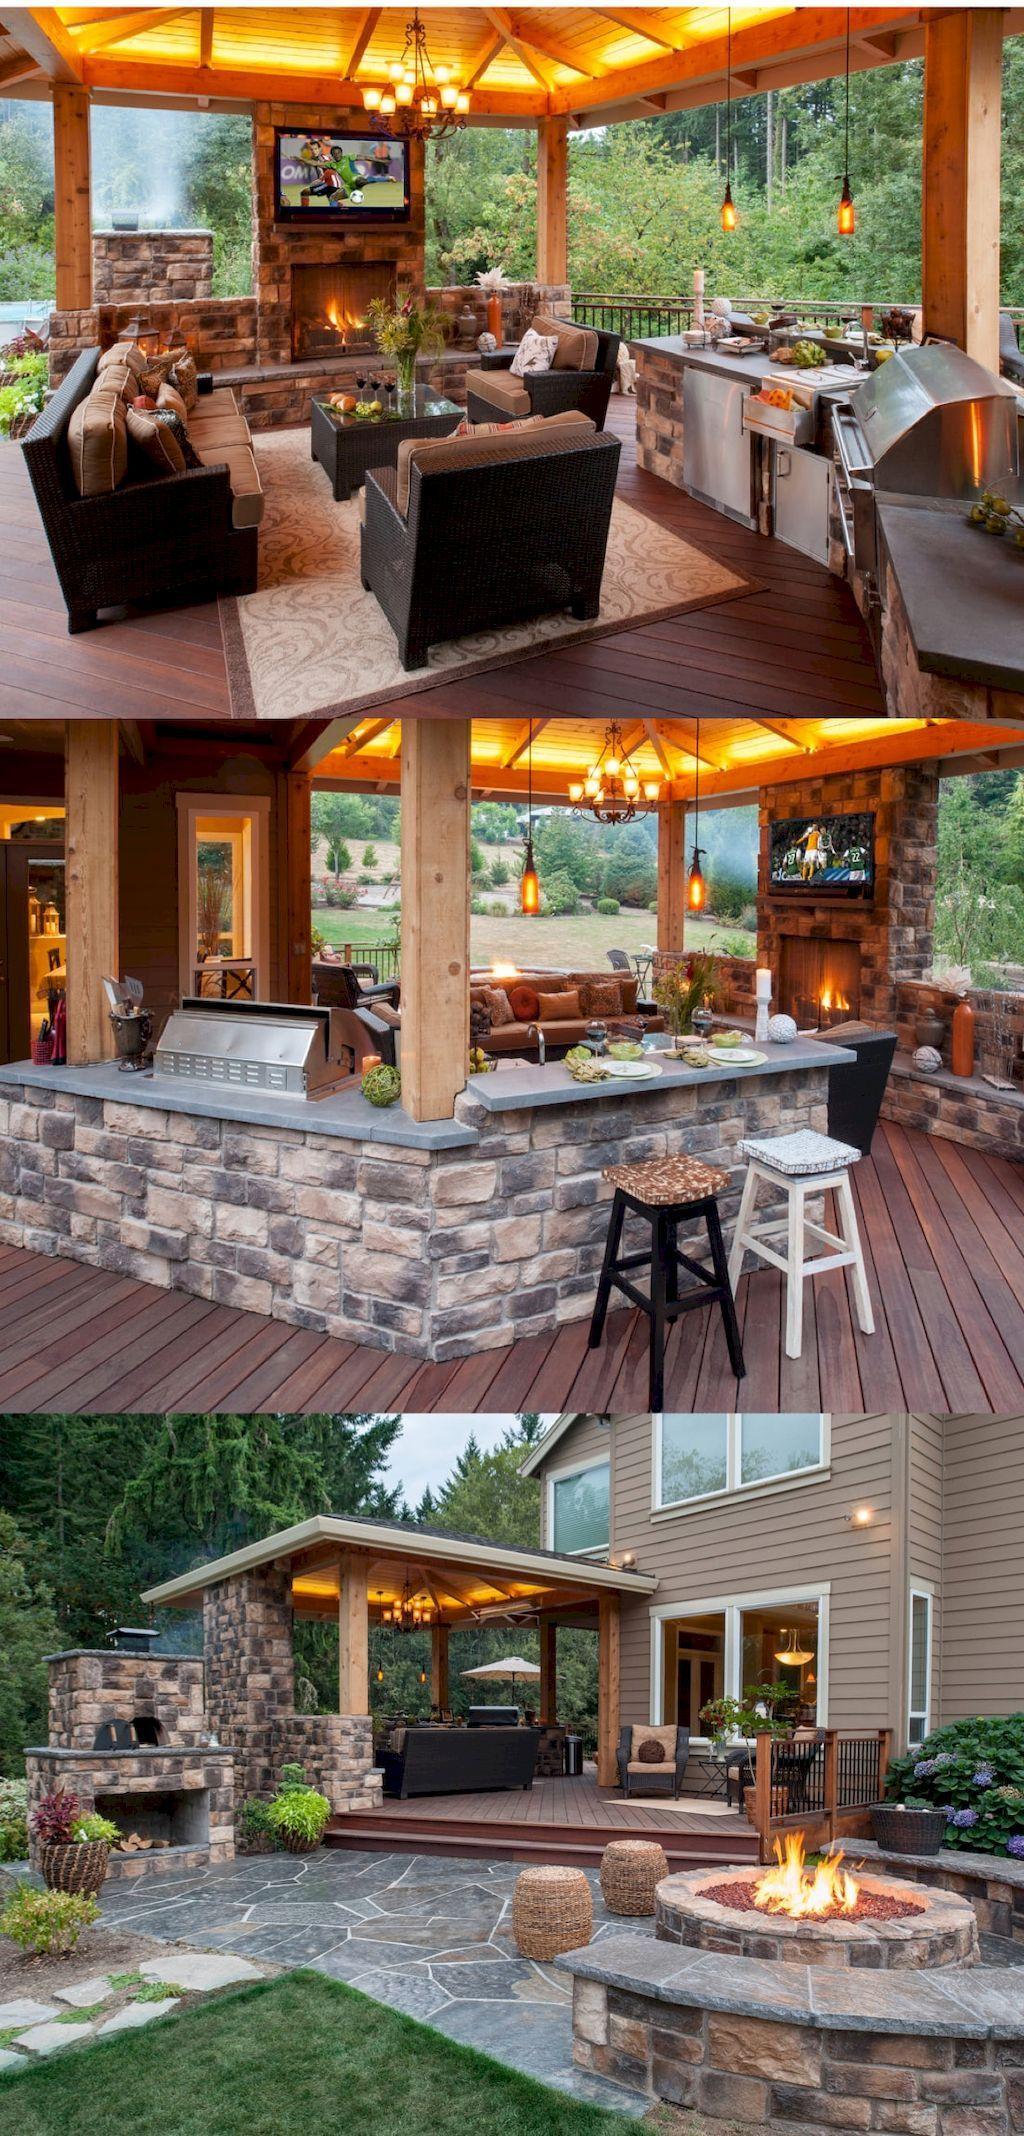 47 Incredible Outdoor Kitchen Design Ideas On Backyard (4)